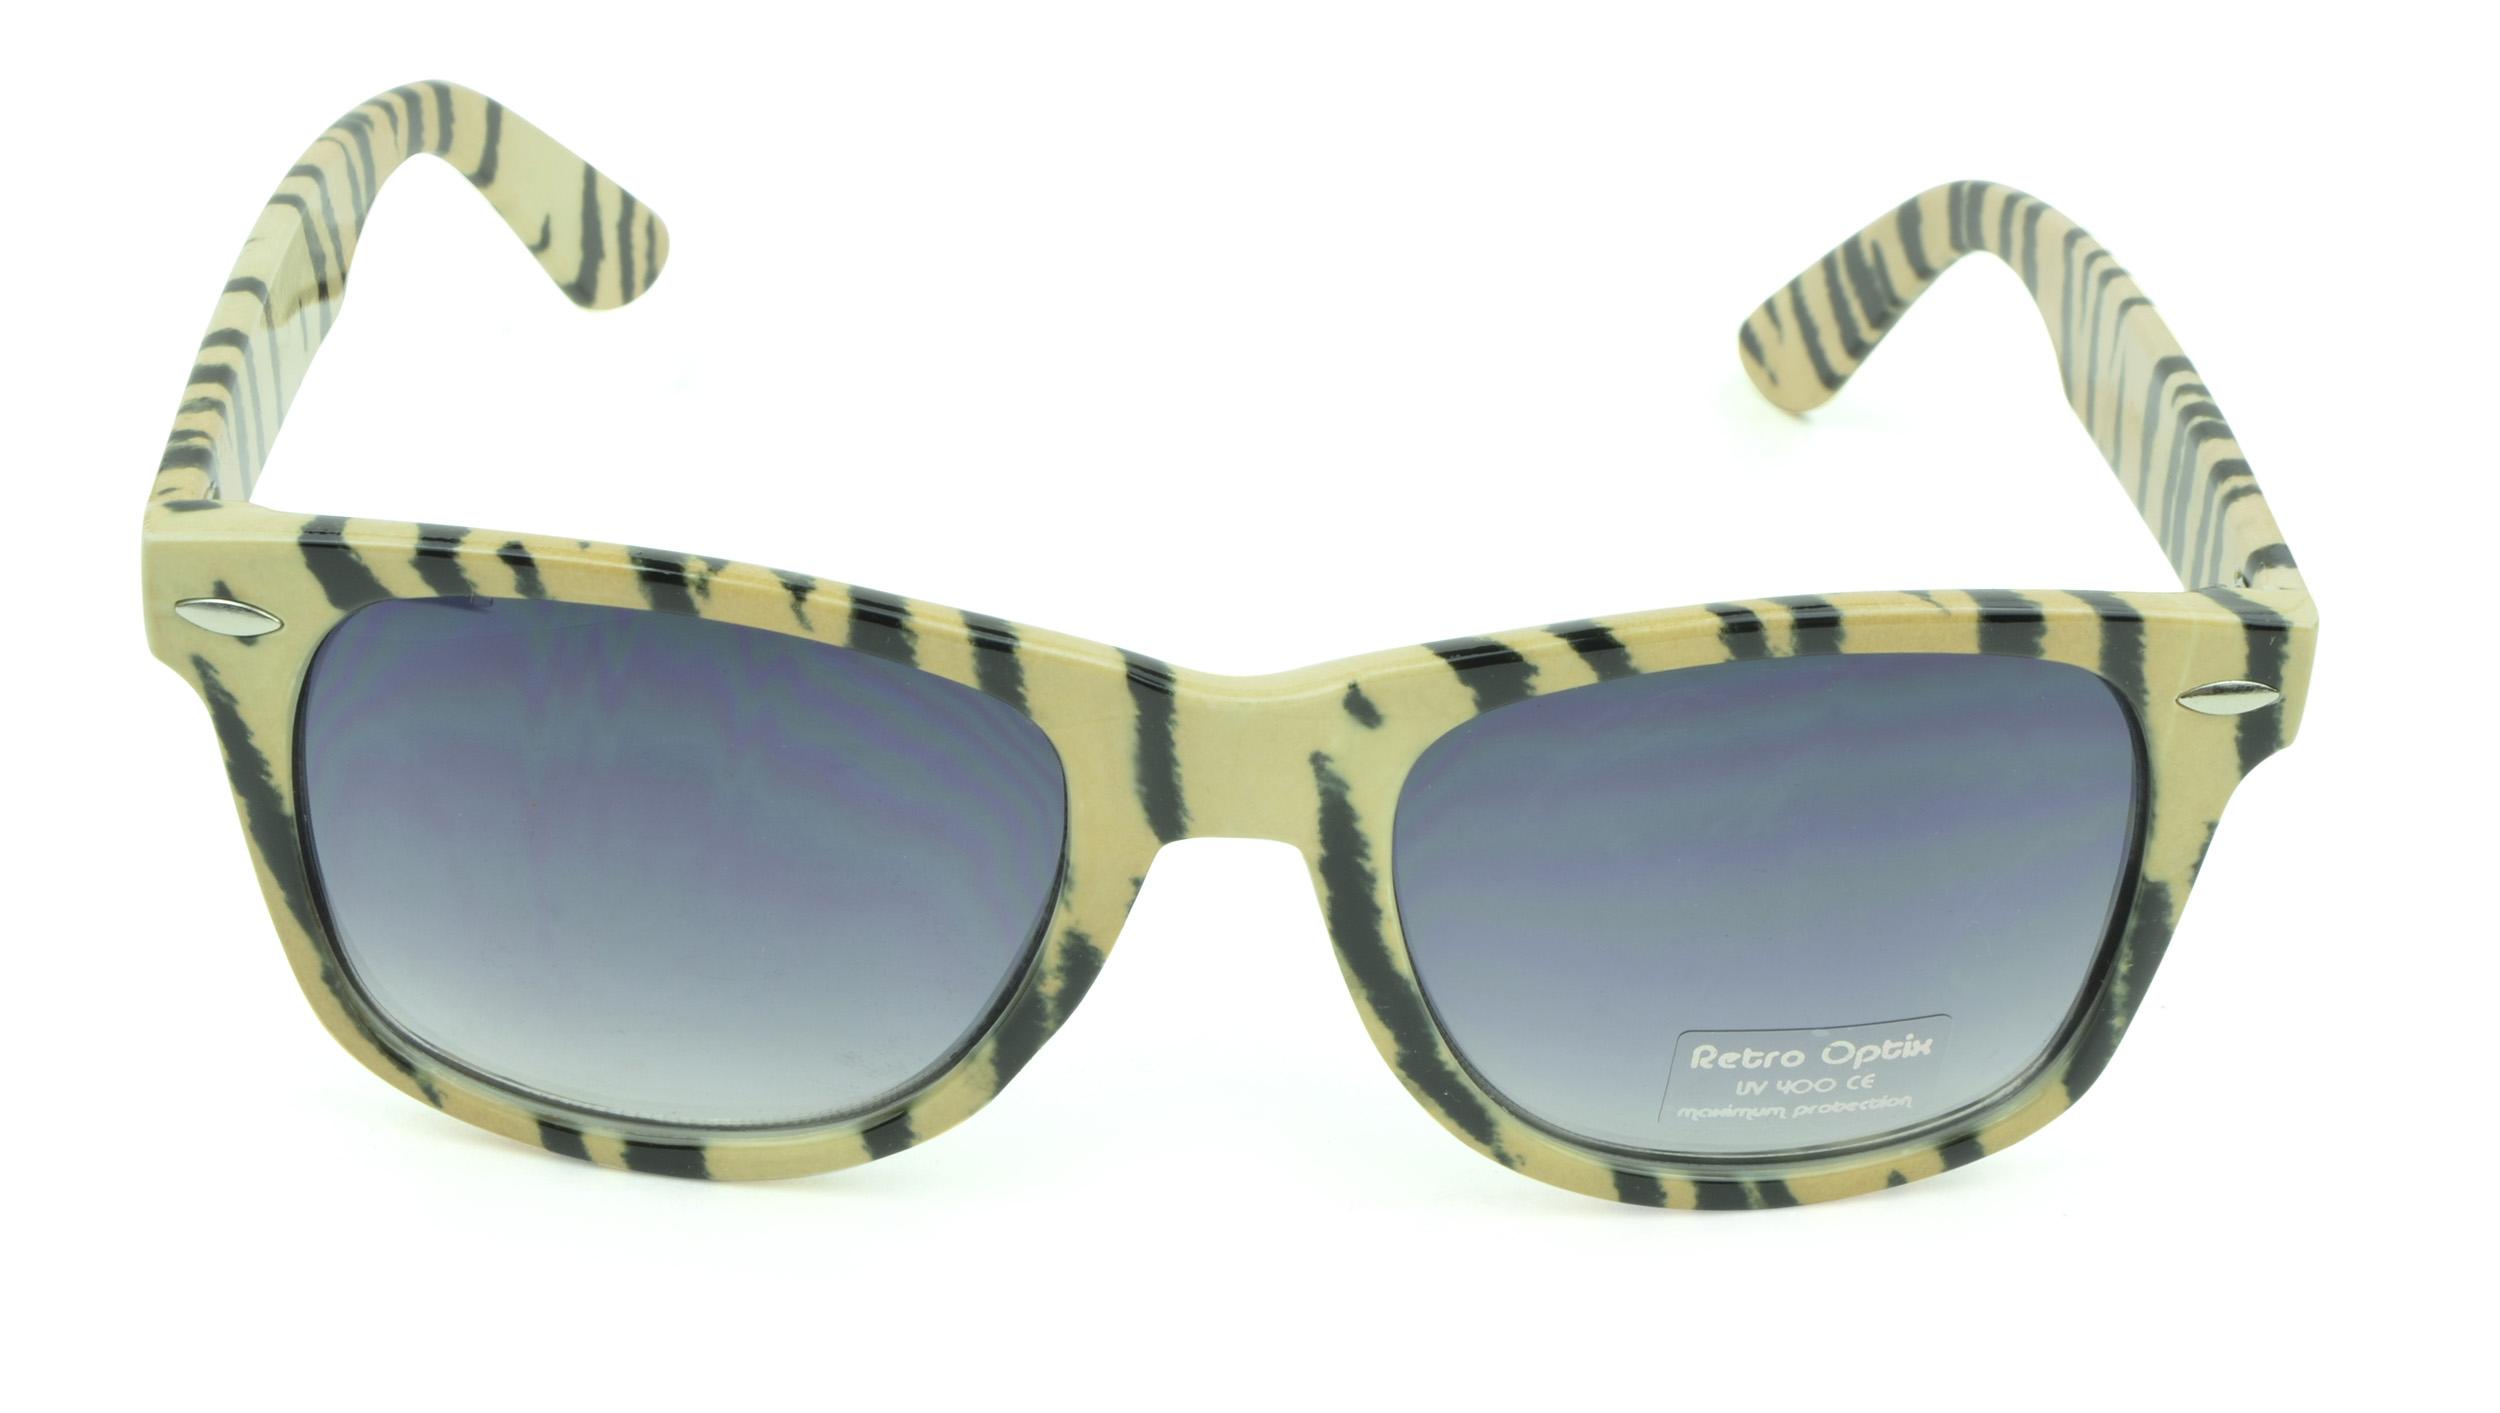 Belle Donne - Wayfarer Style Sunglasses Trendy Cheap Sunglasses High Quality Animal Print - Tan